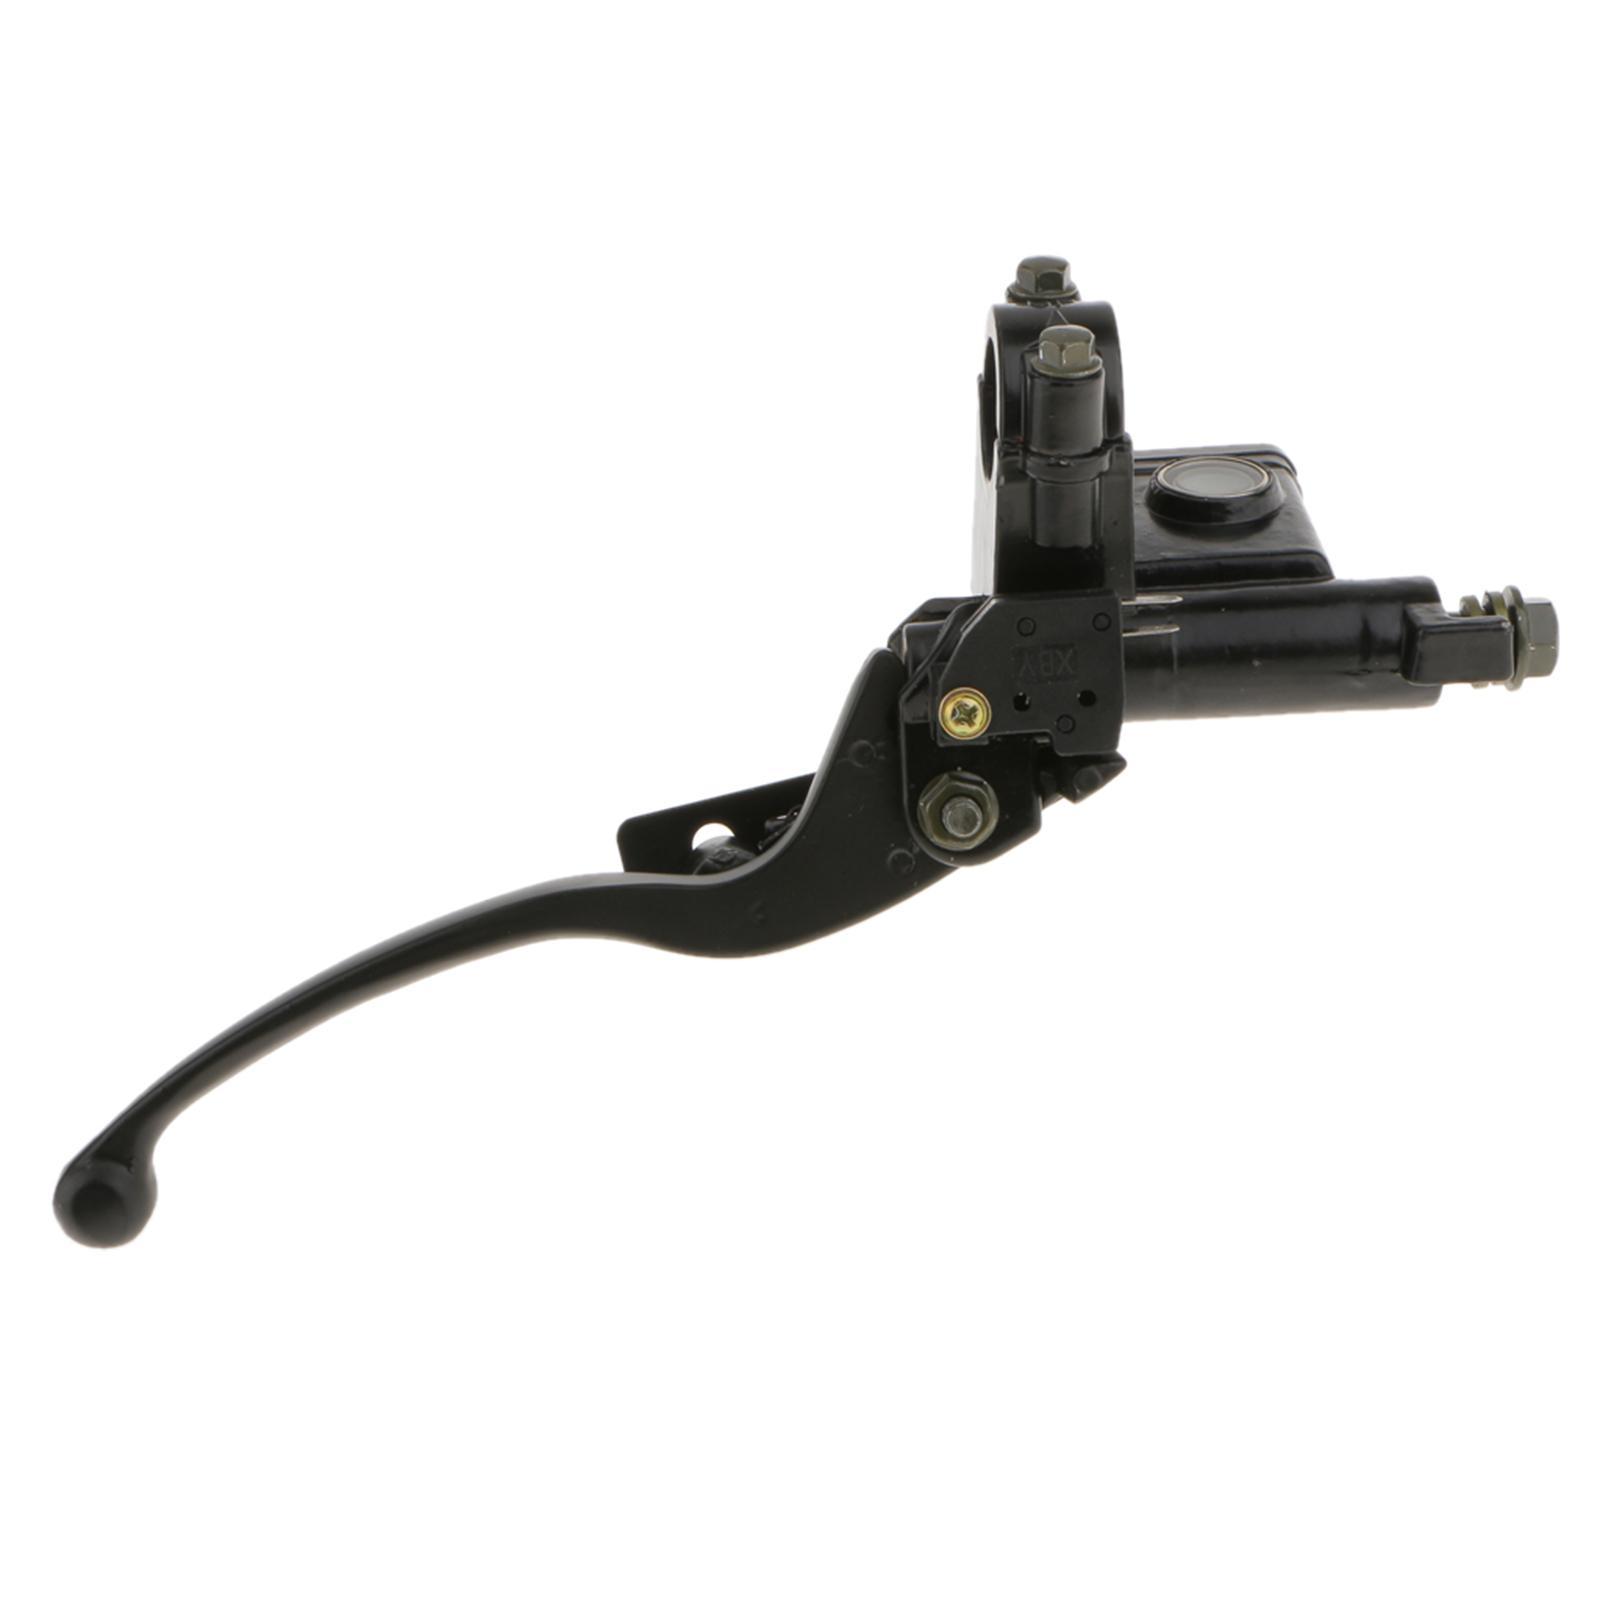 Ds 90 Brake Lever : Left hydraulic brake master cylinder lever cc